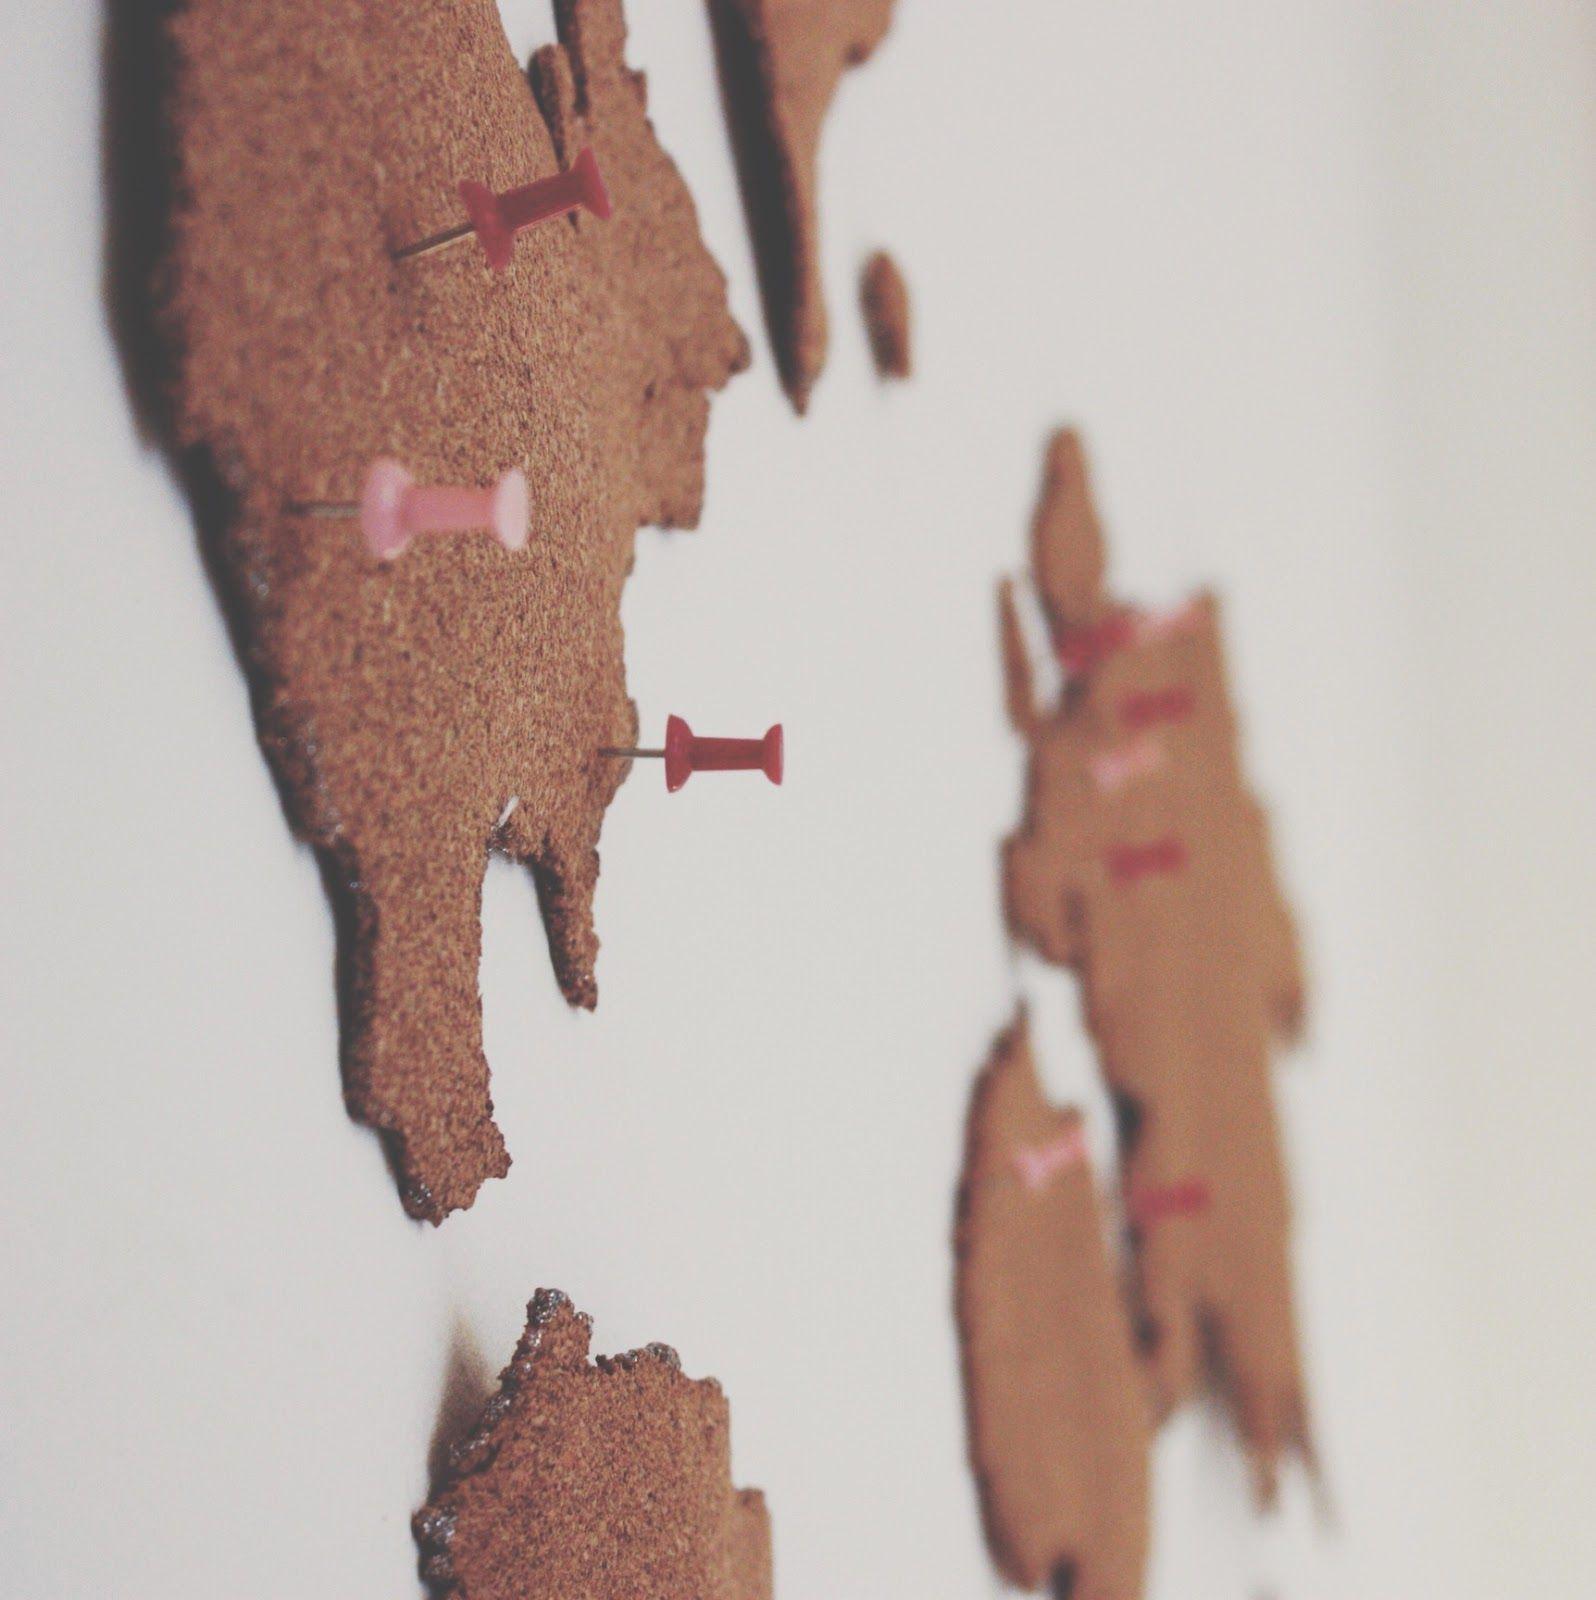 Make your own cork board map pinterest cork boards cork and board make your own cork board map the sassy street gumiabroncs Gallery